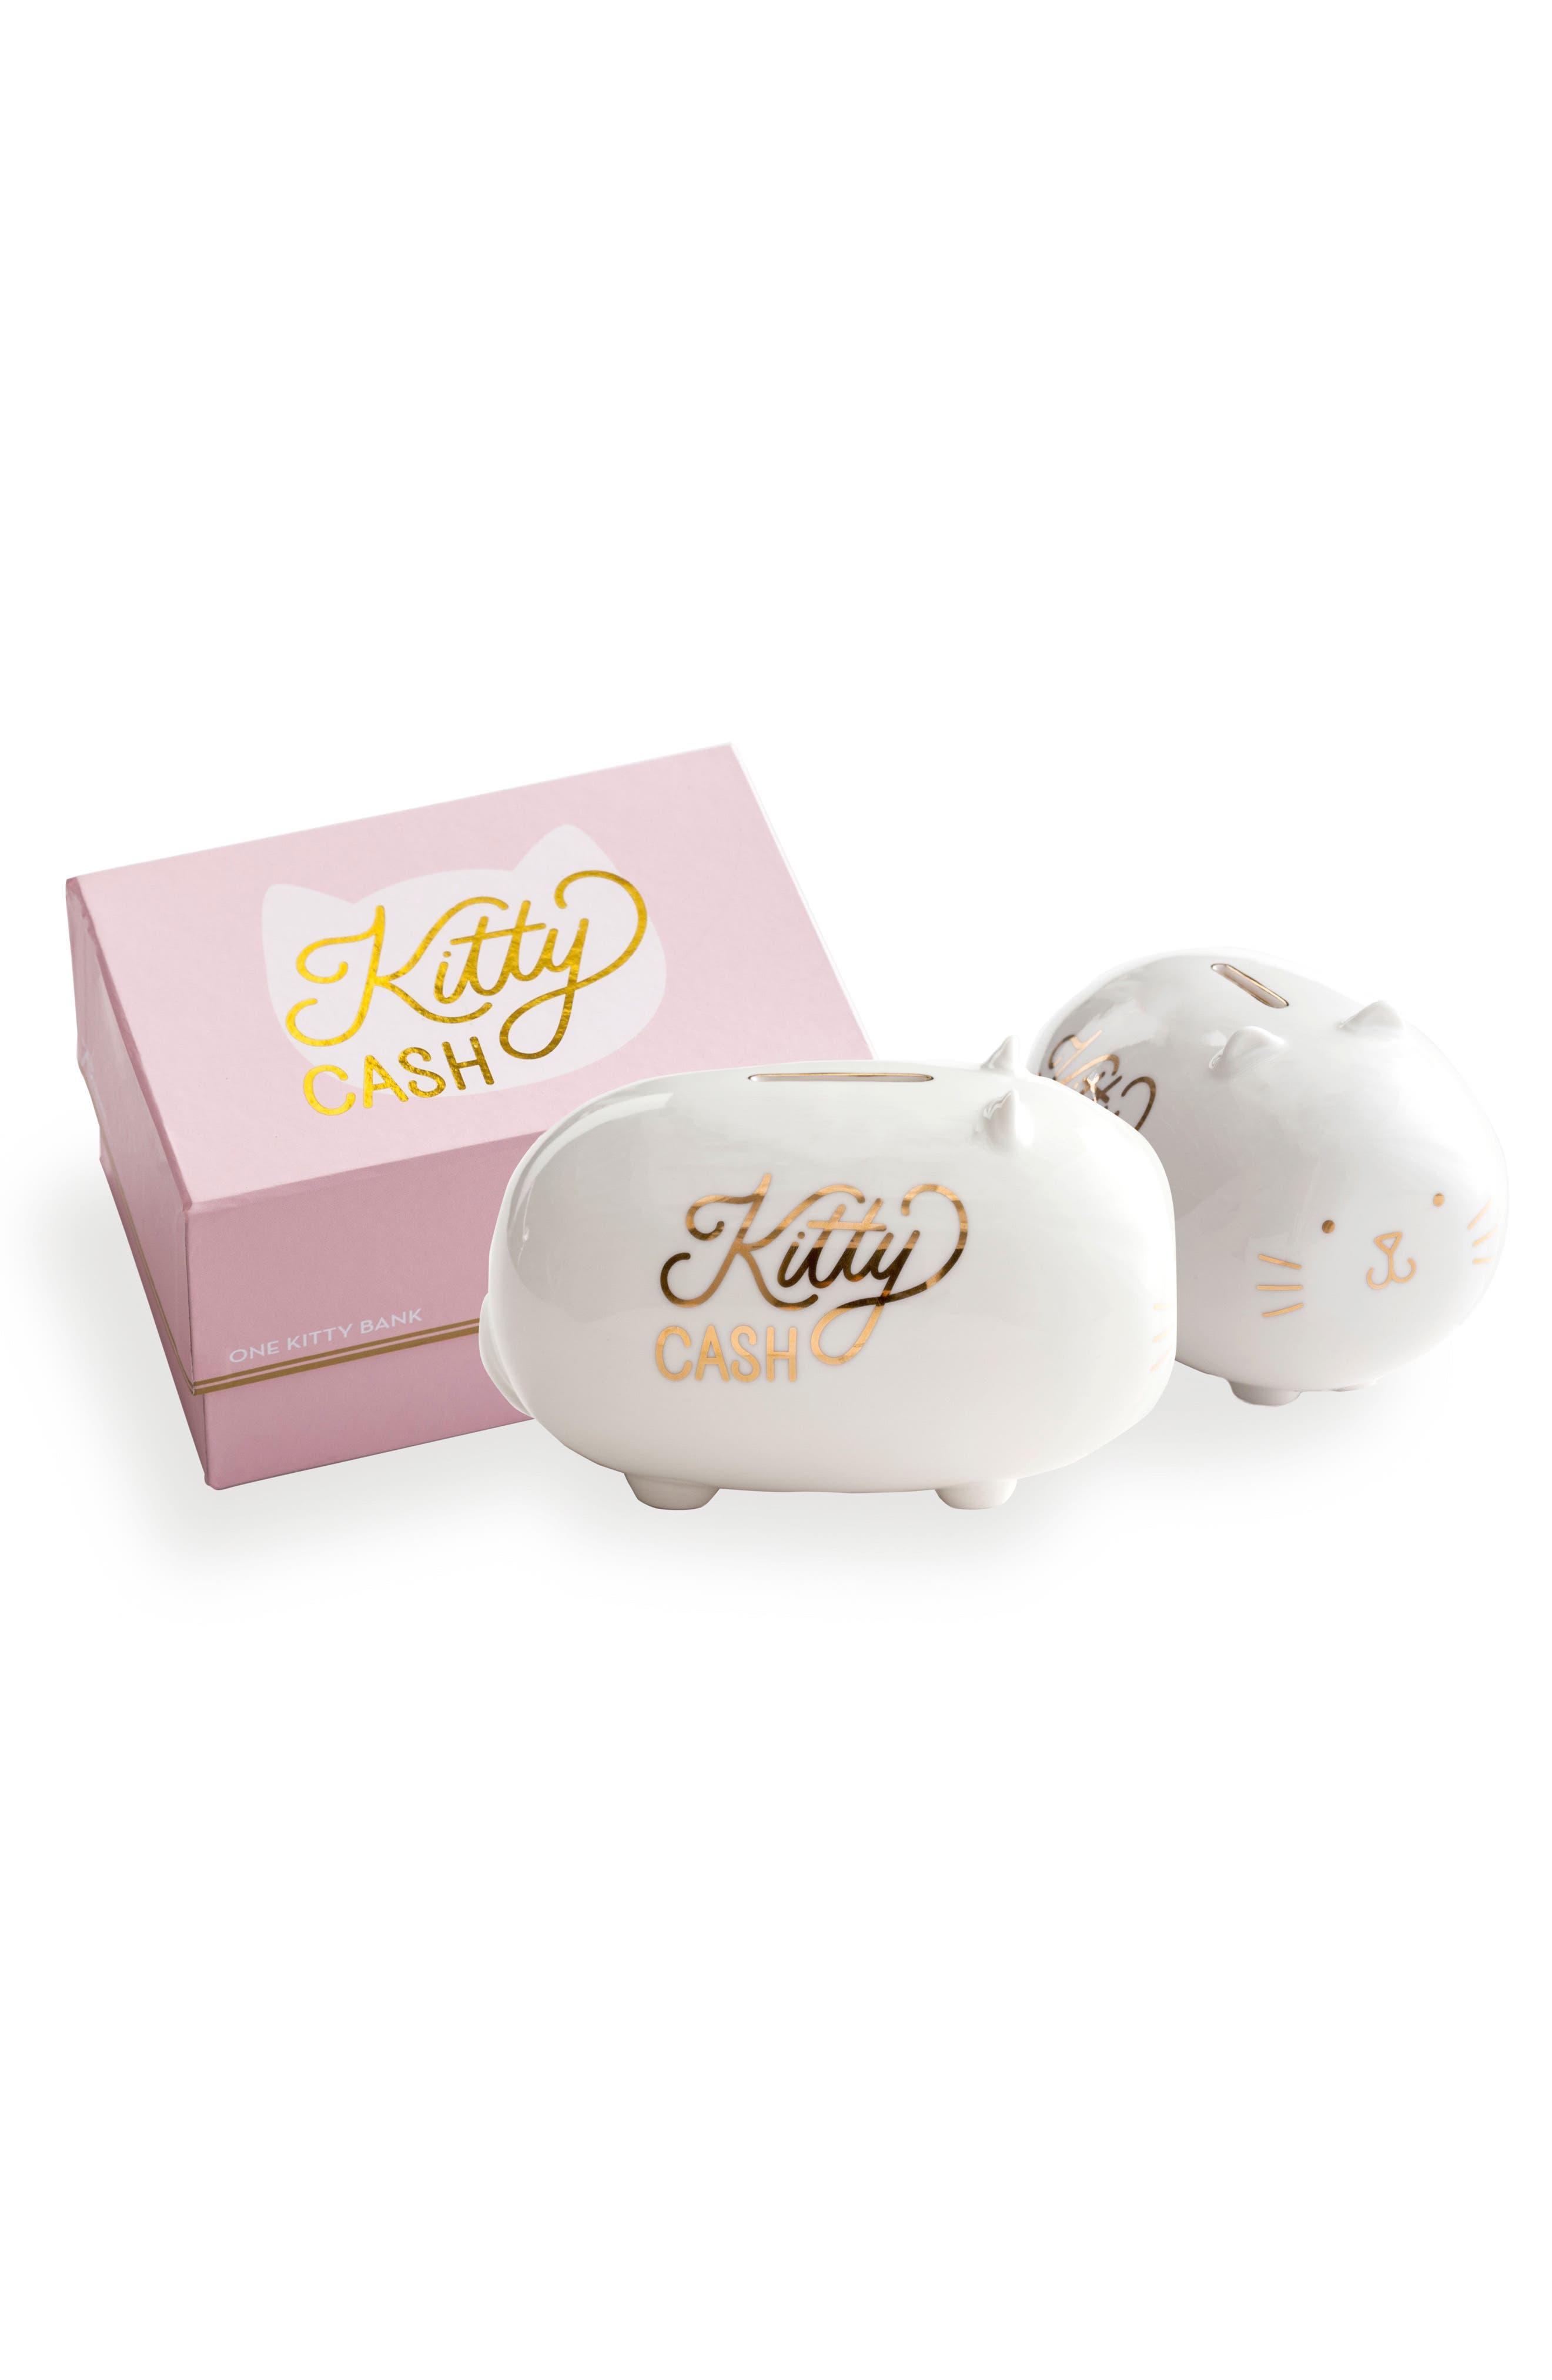 Rosanna Kitty Cash Porcelain Bank